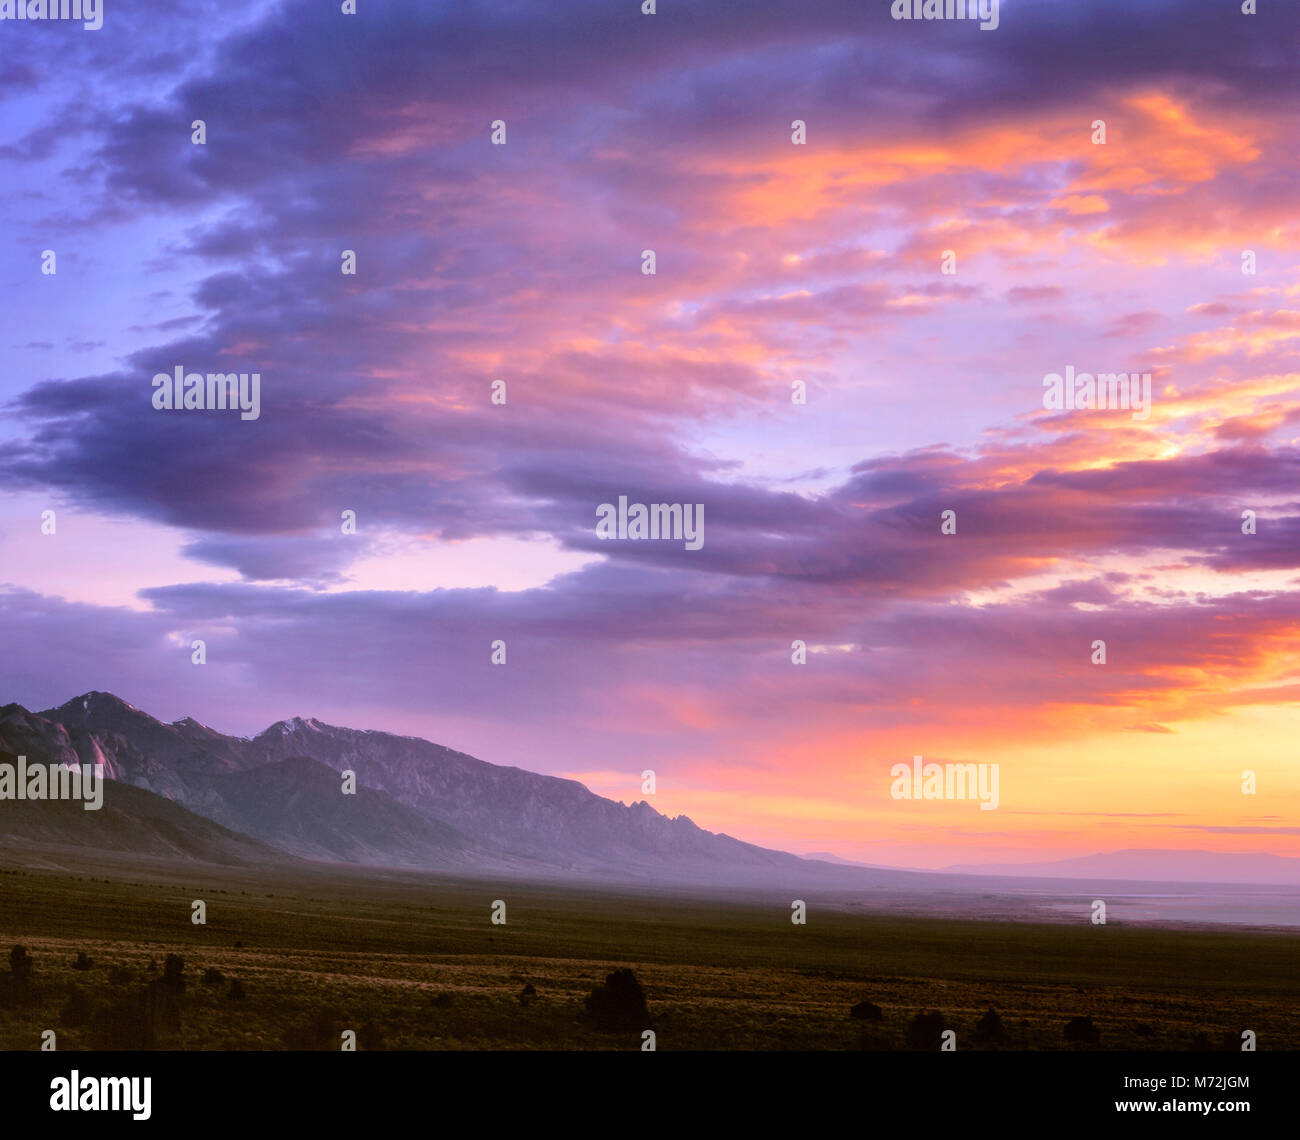 Dawn, Toiyabe Range, Toiyabe National Forest, Nevada - Stock Image